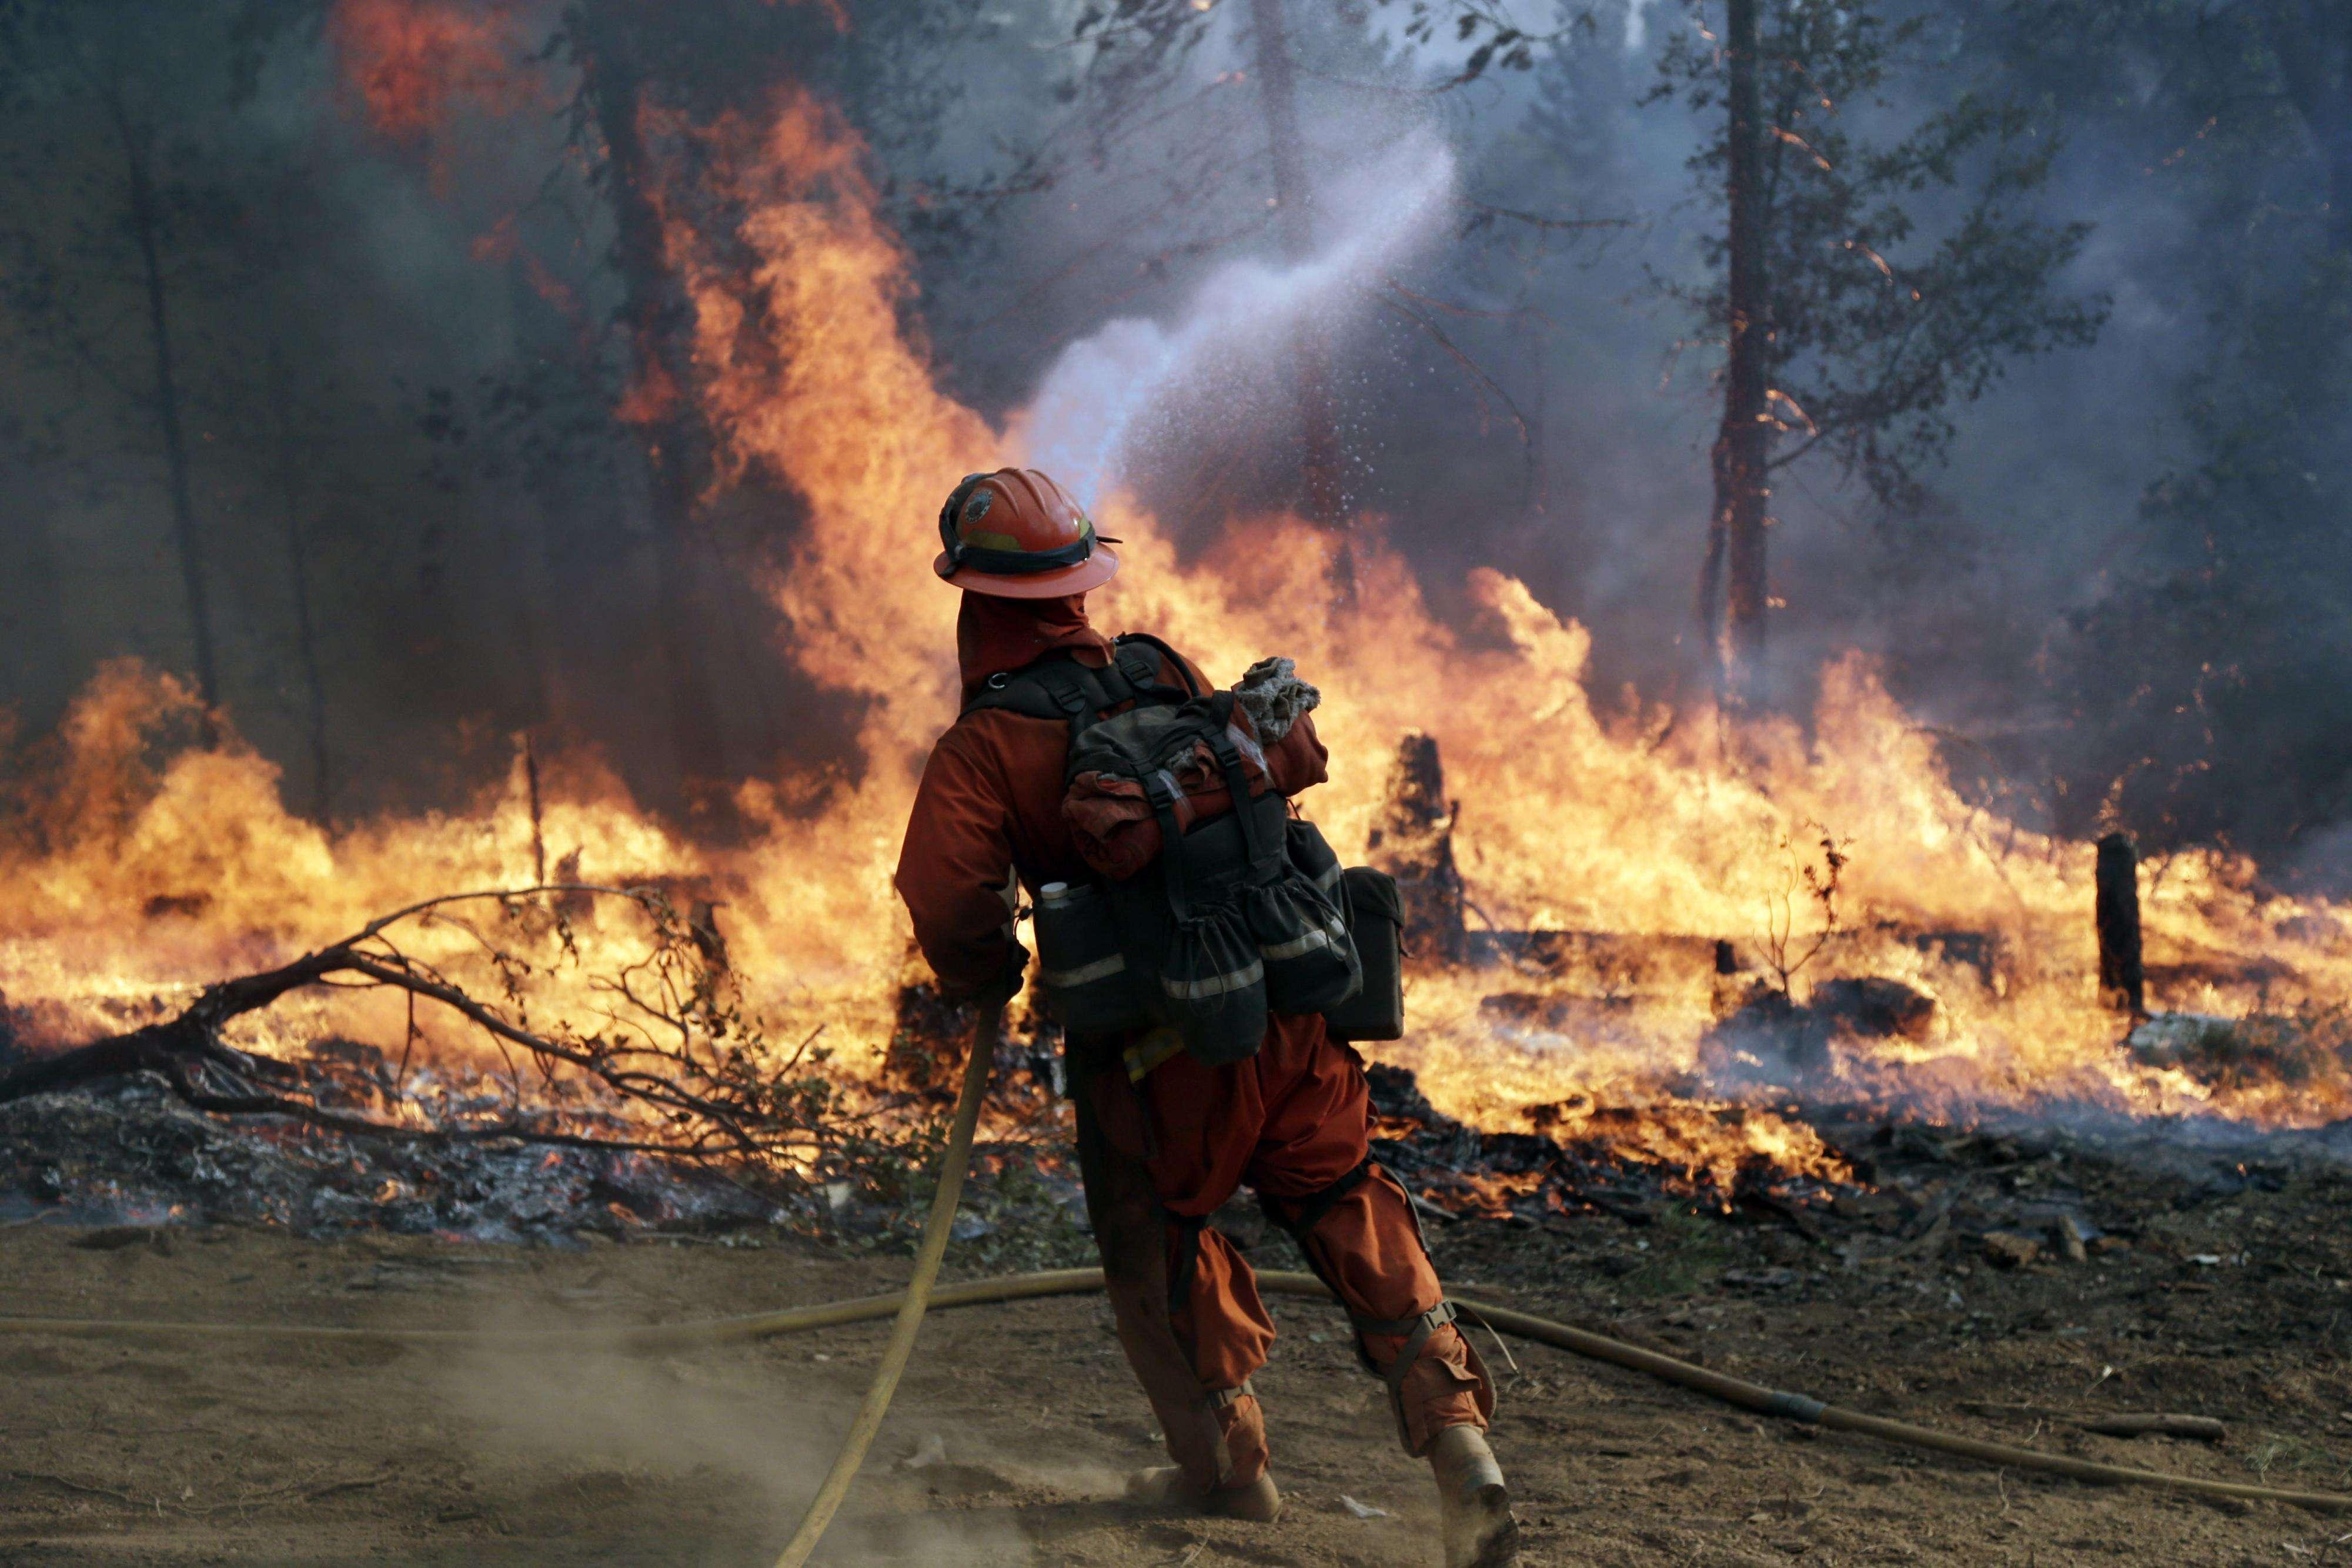 Un bombero trata de sofocar las llamas cerca de Placerville, en California. Foto: AP en español